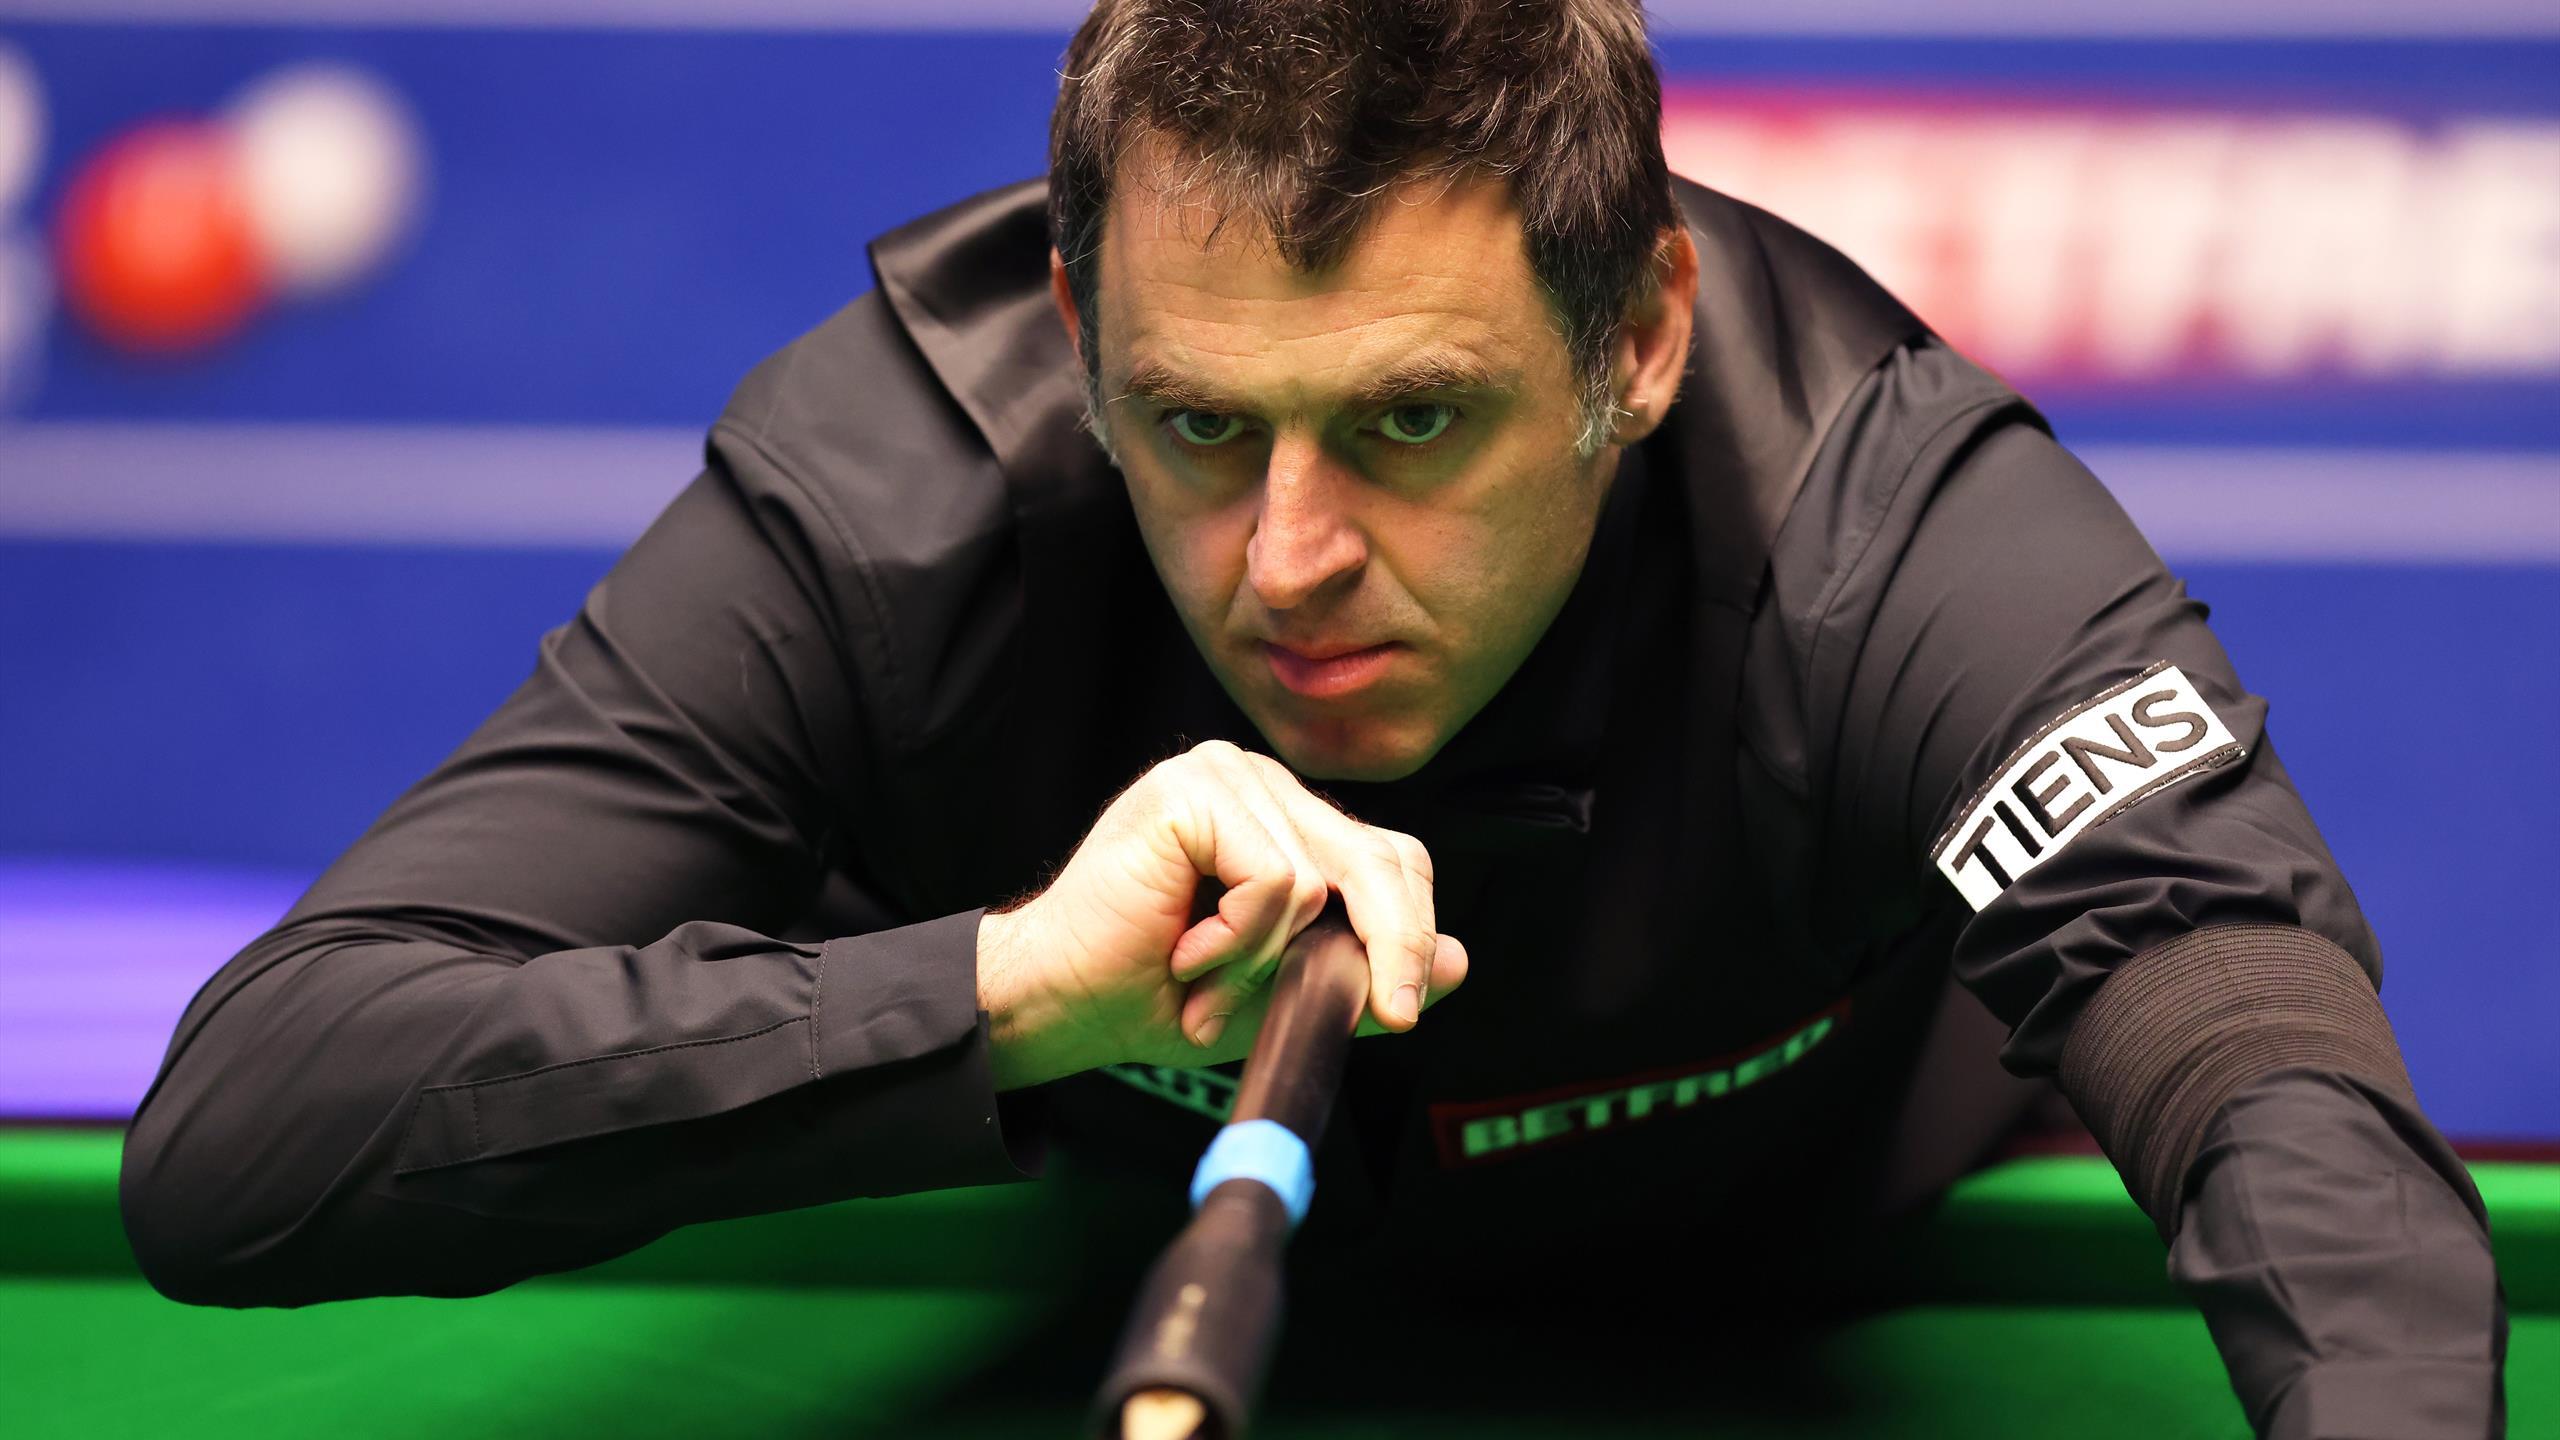 Calendrier Snooker 2022 Snooker news : Quand commence la saison 2021/22 ? Ronnie O